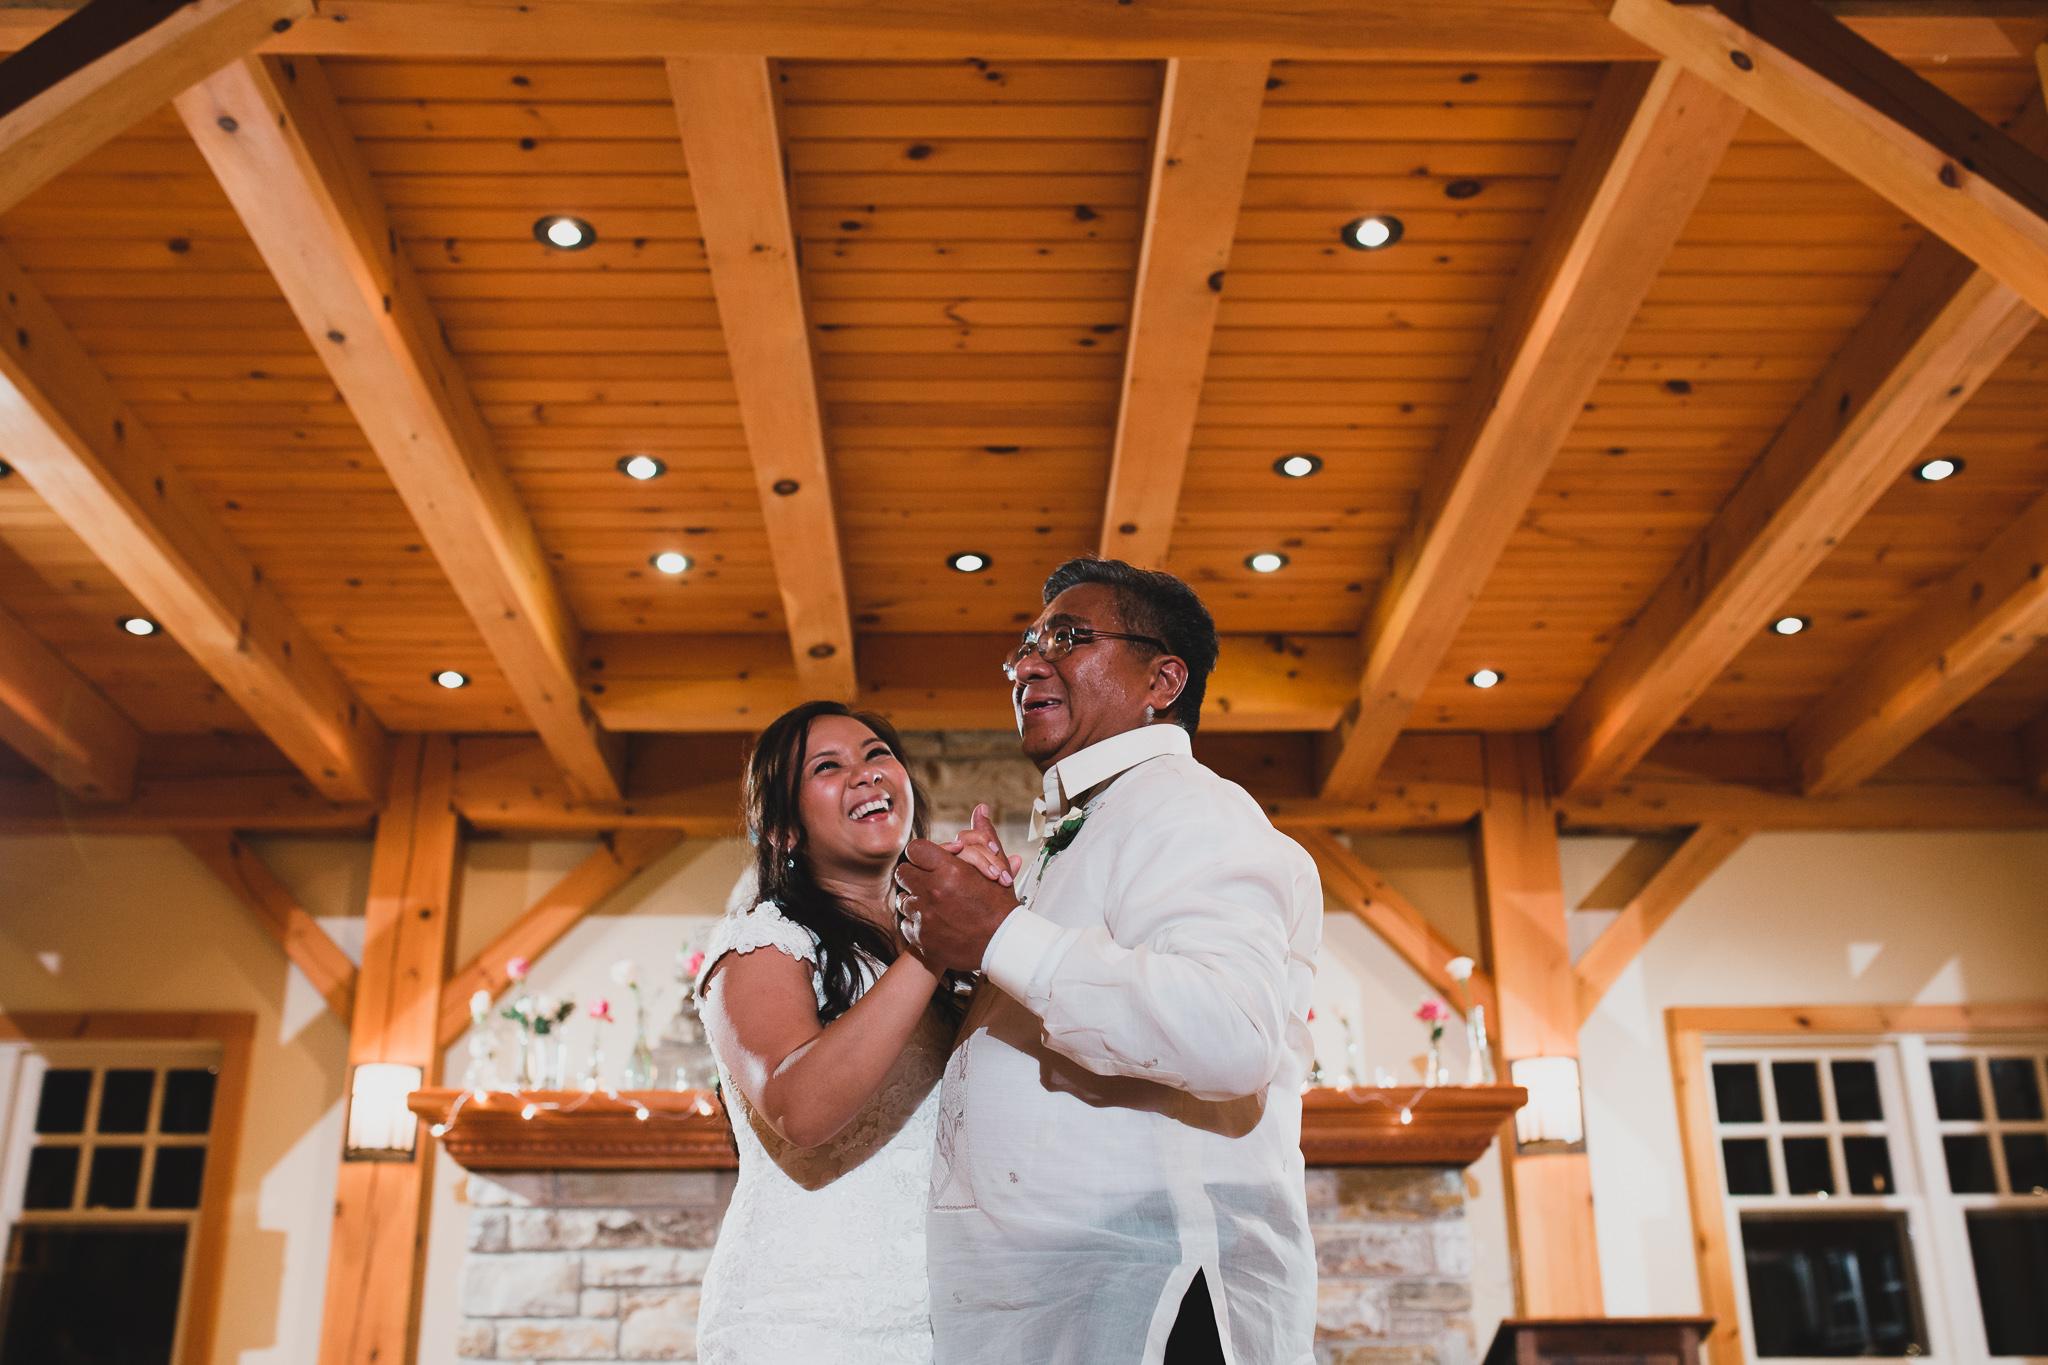 Casual Ottawa area wedding venues